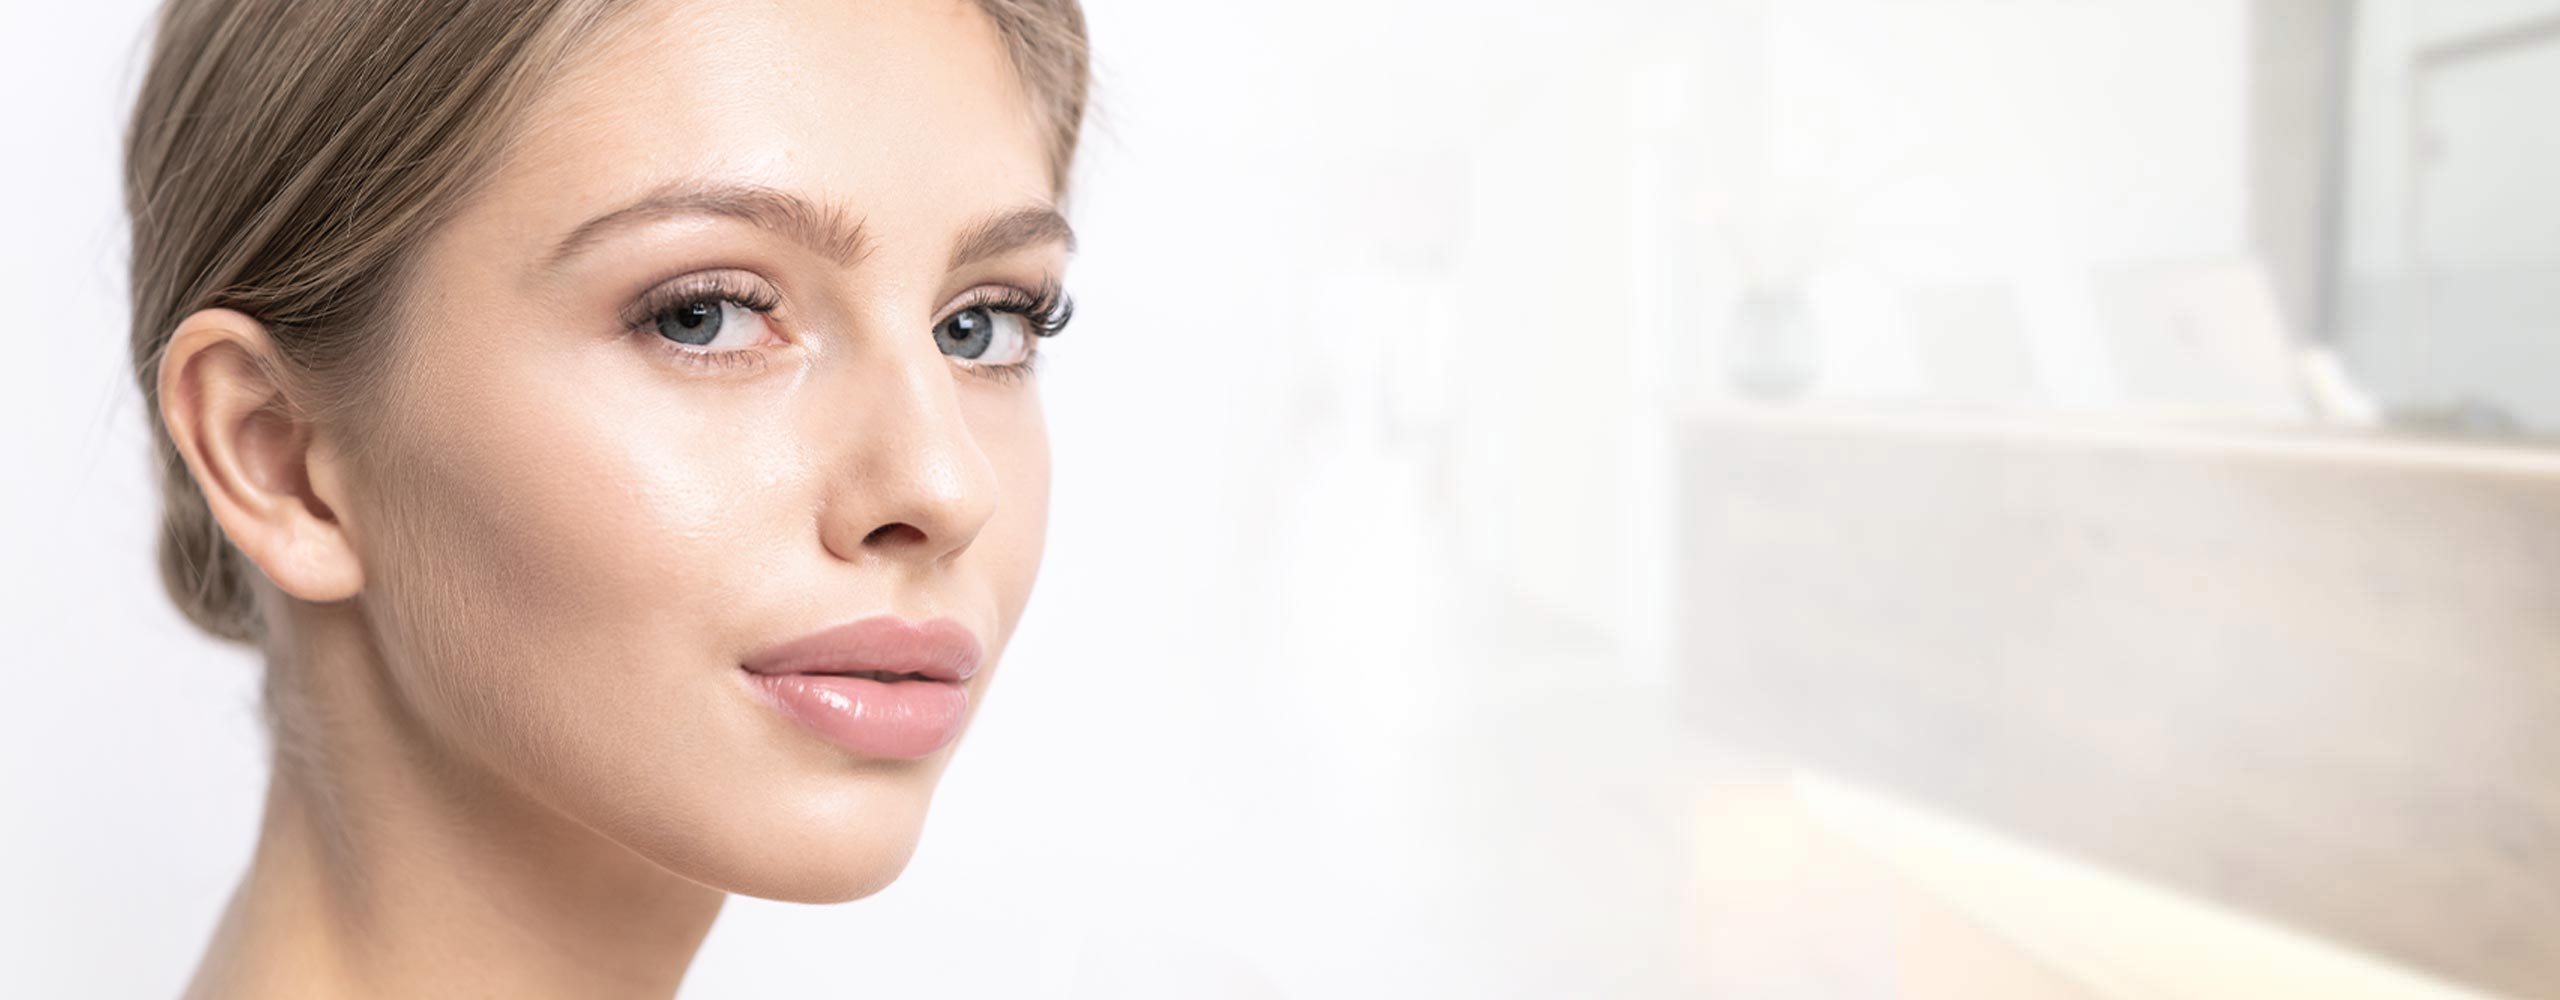 russian lips technique schoenheitsklinik proaesthetic